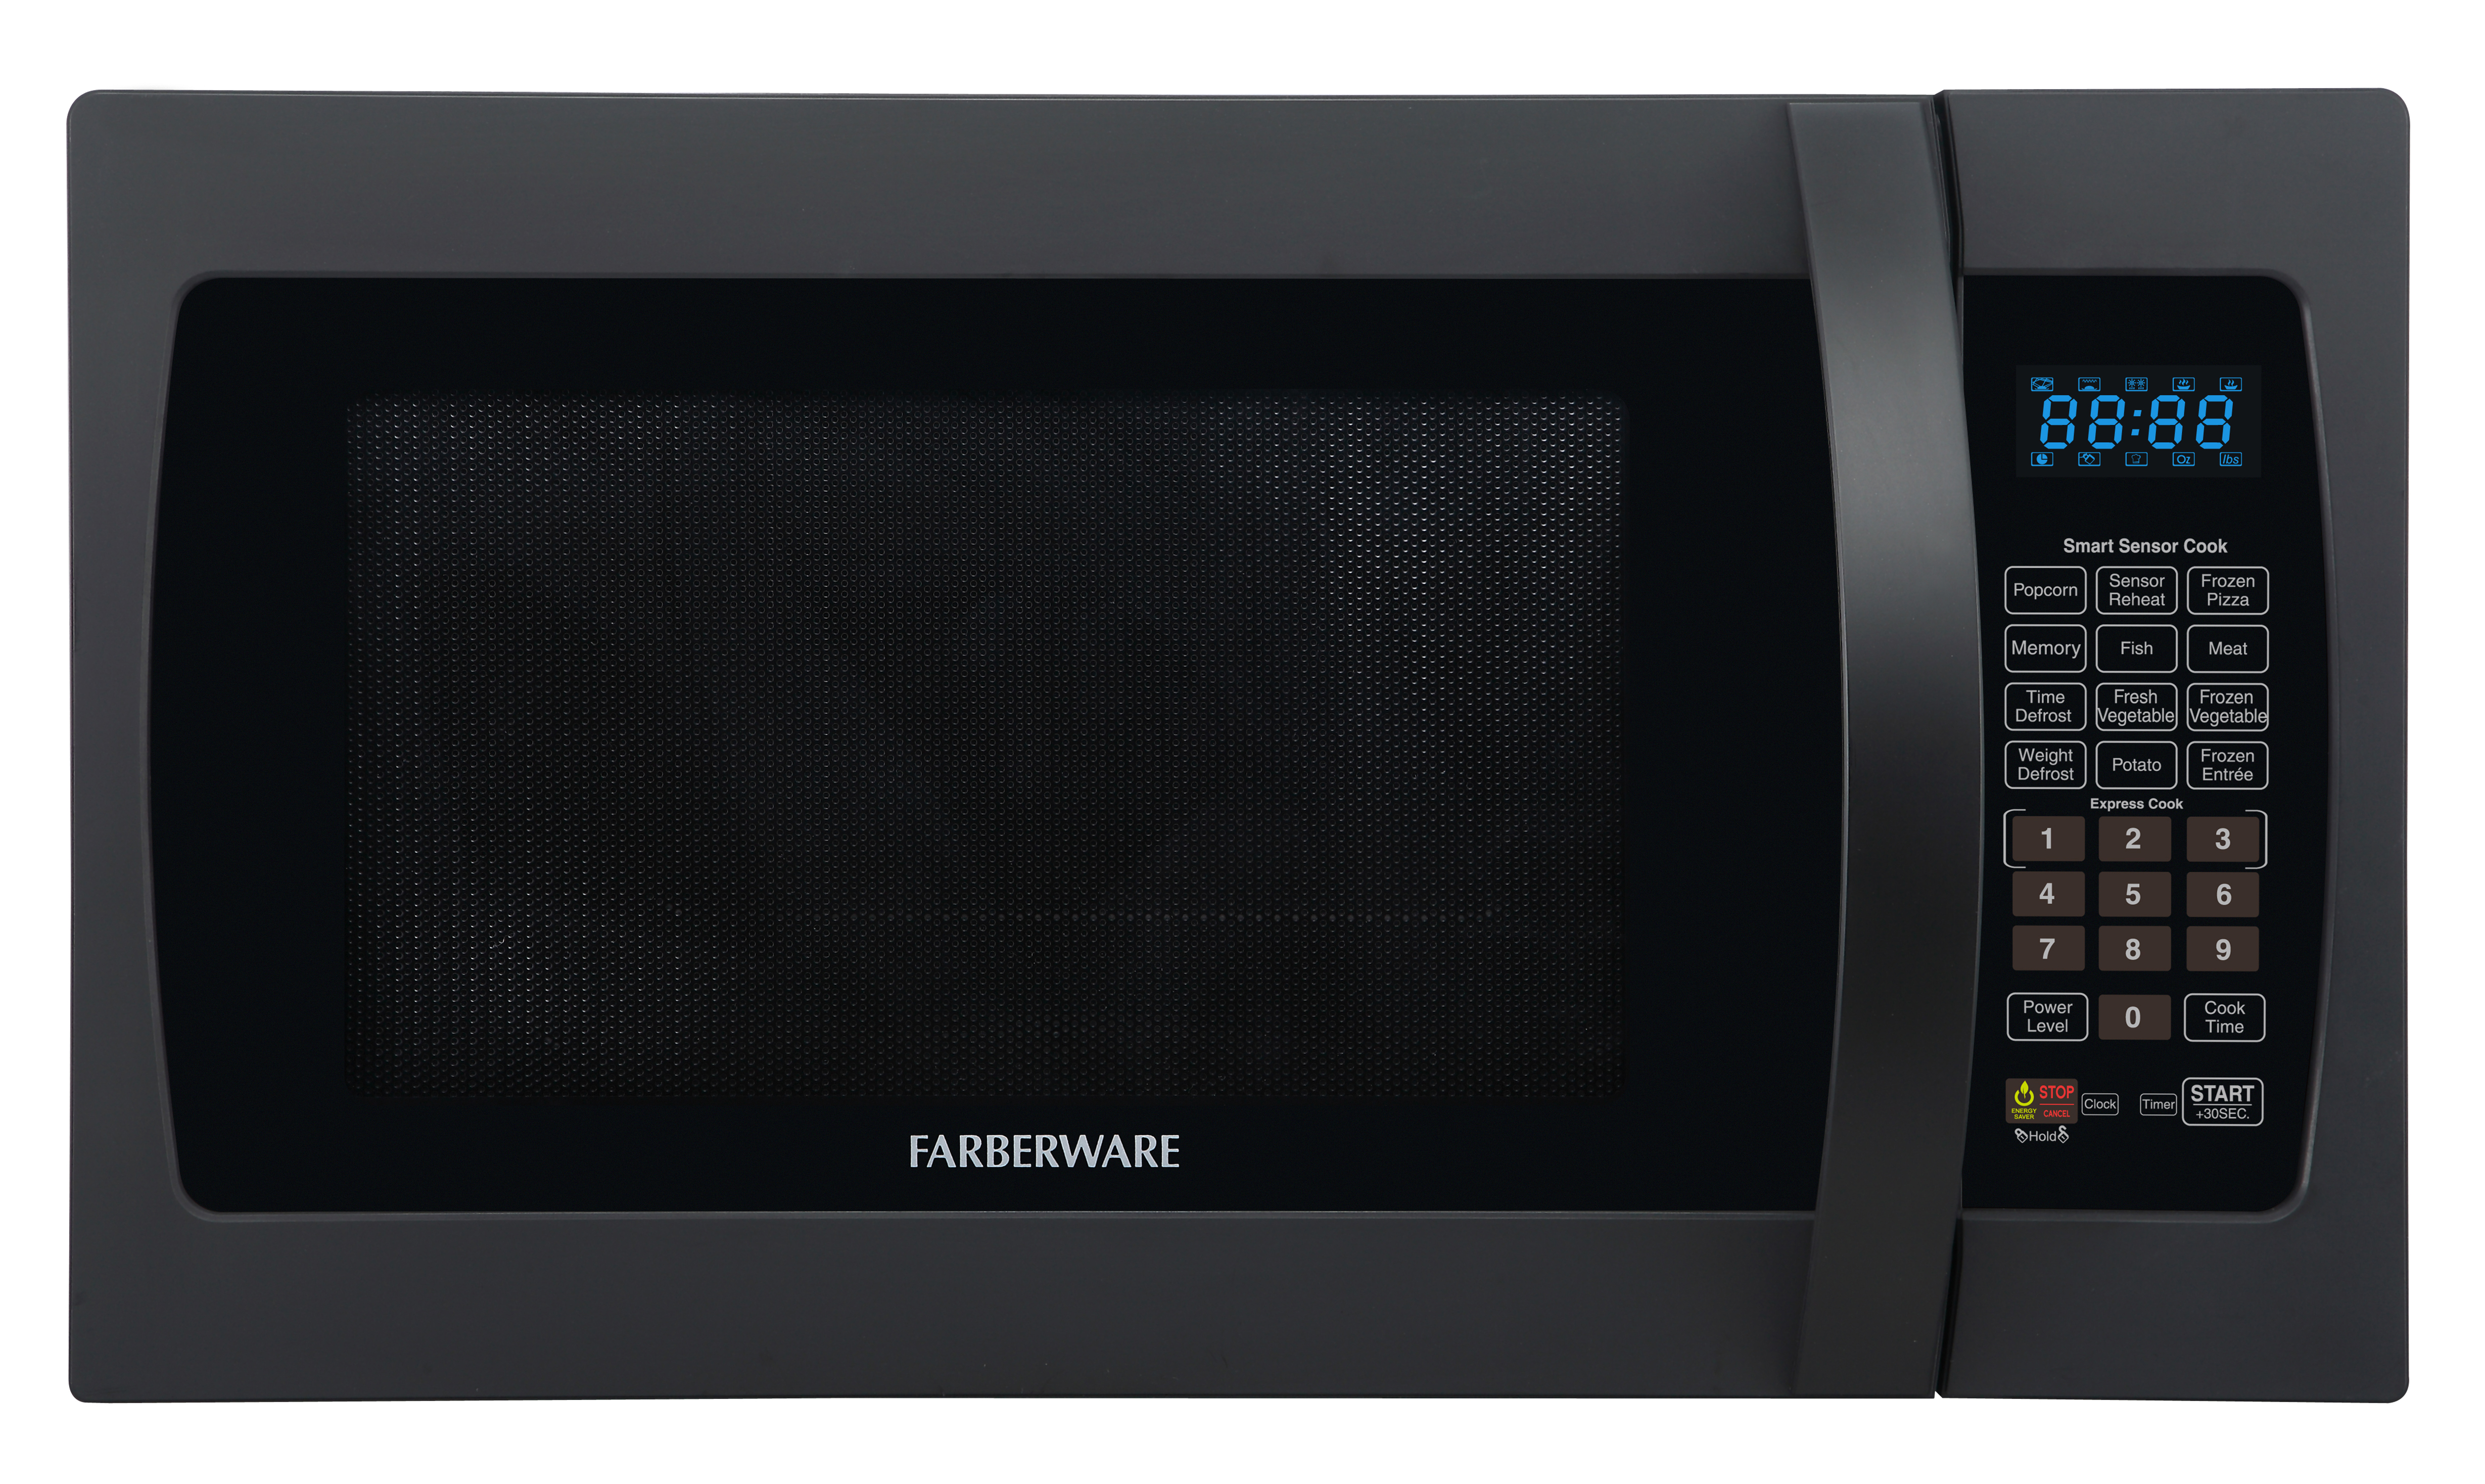 Farberware Professional FMO13AHTBKF 1.3 Cu. Ft 1100-Watt Microwave Oven with Smart Sensor Cooking, Frozen Black